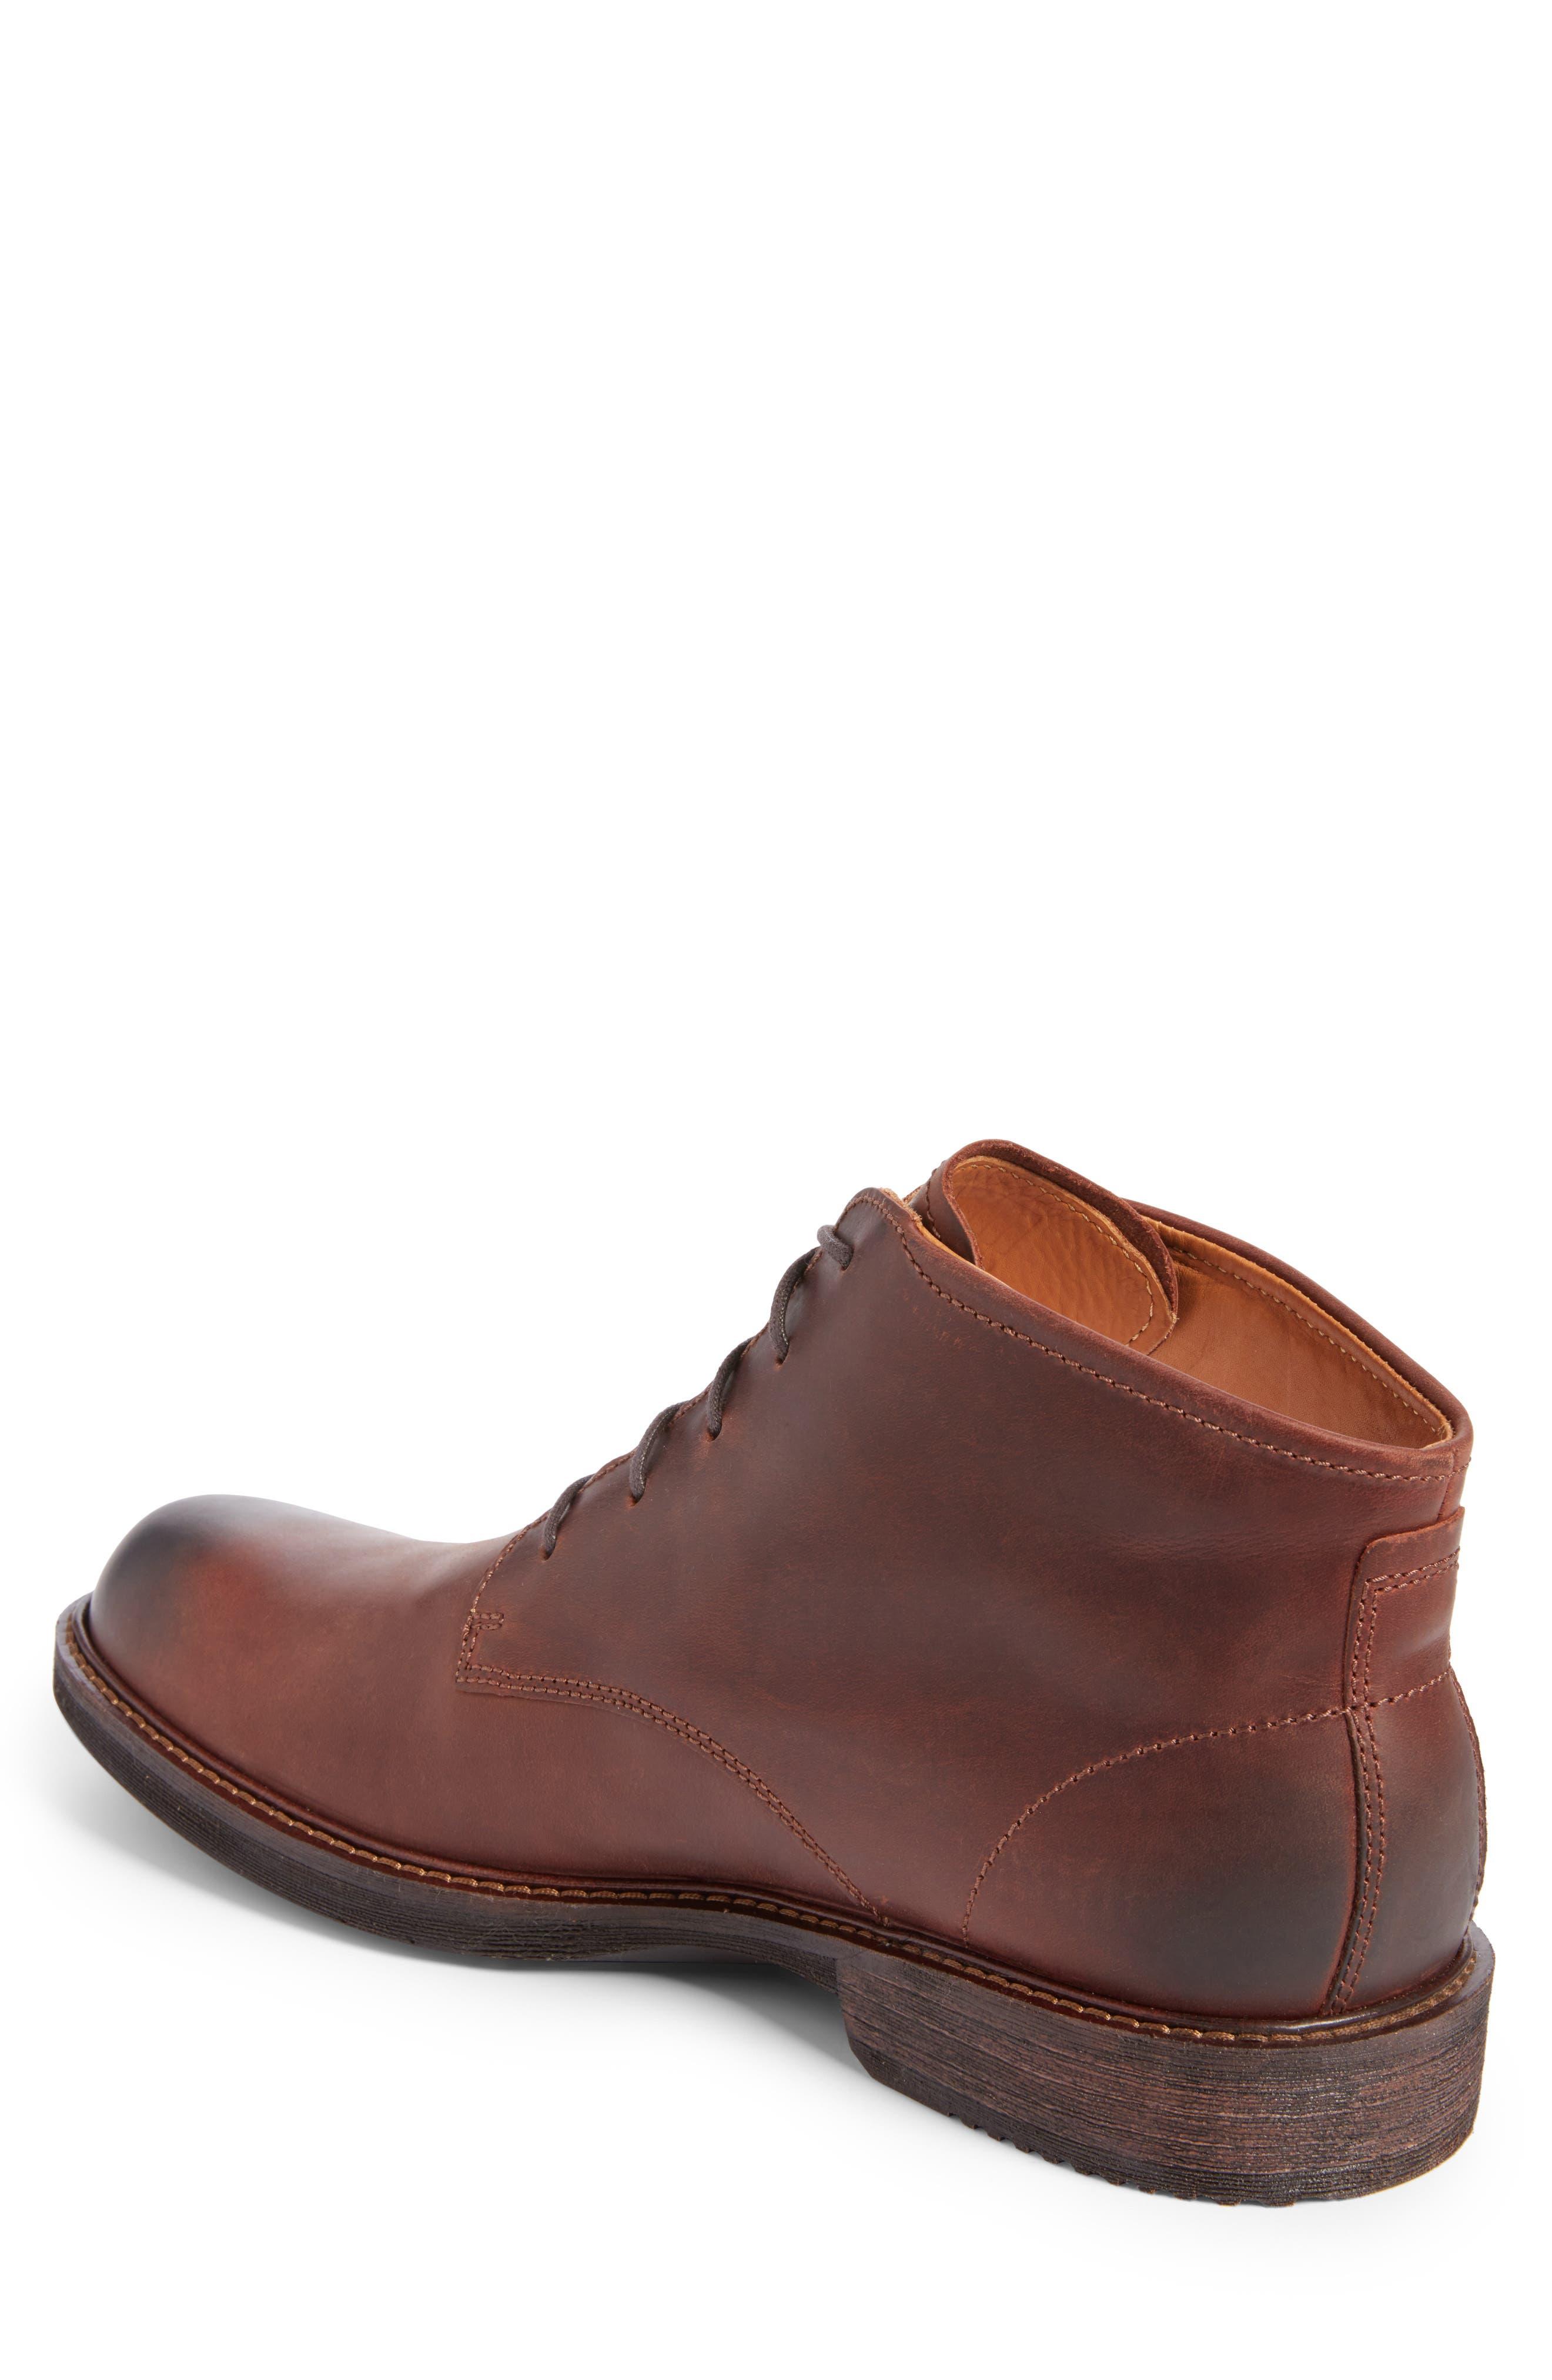 Alternate Image 2  - ECCO 'Kenton' Plain Toe Boot (Men)